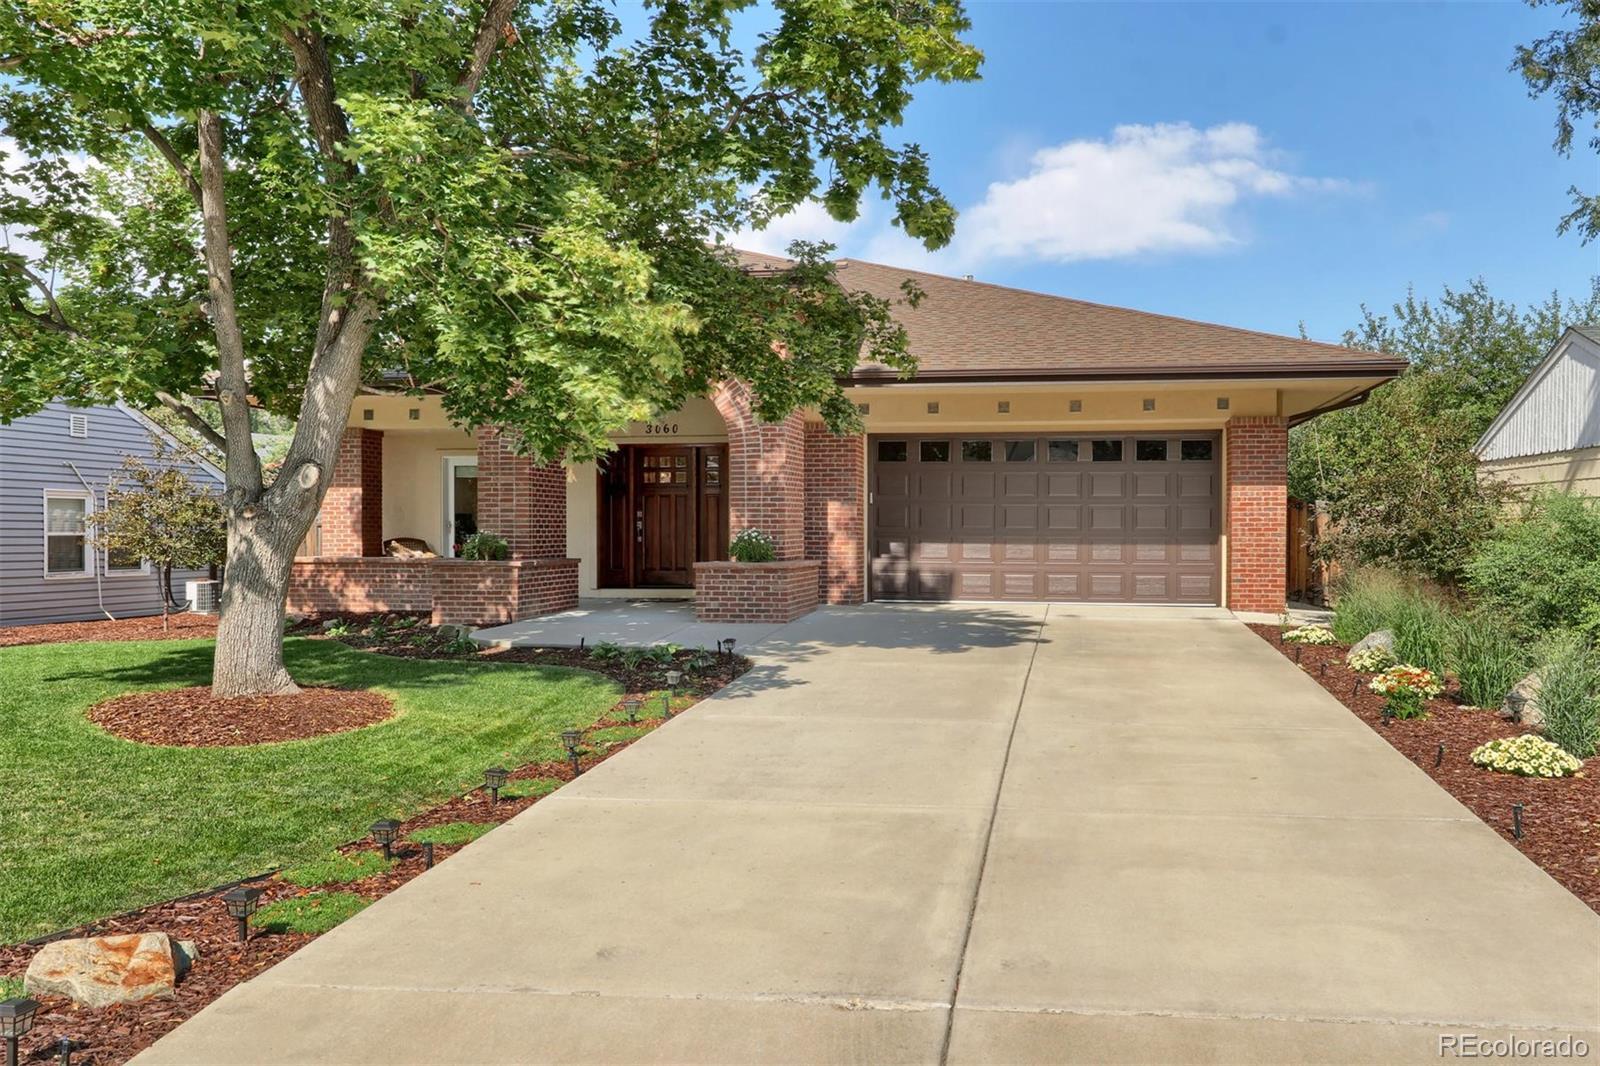 3060 S Birch Street, Denver, CO 80222 - Denver, CO real estate listing